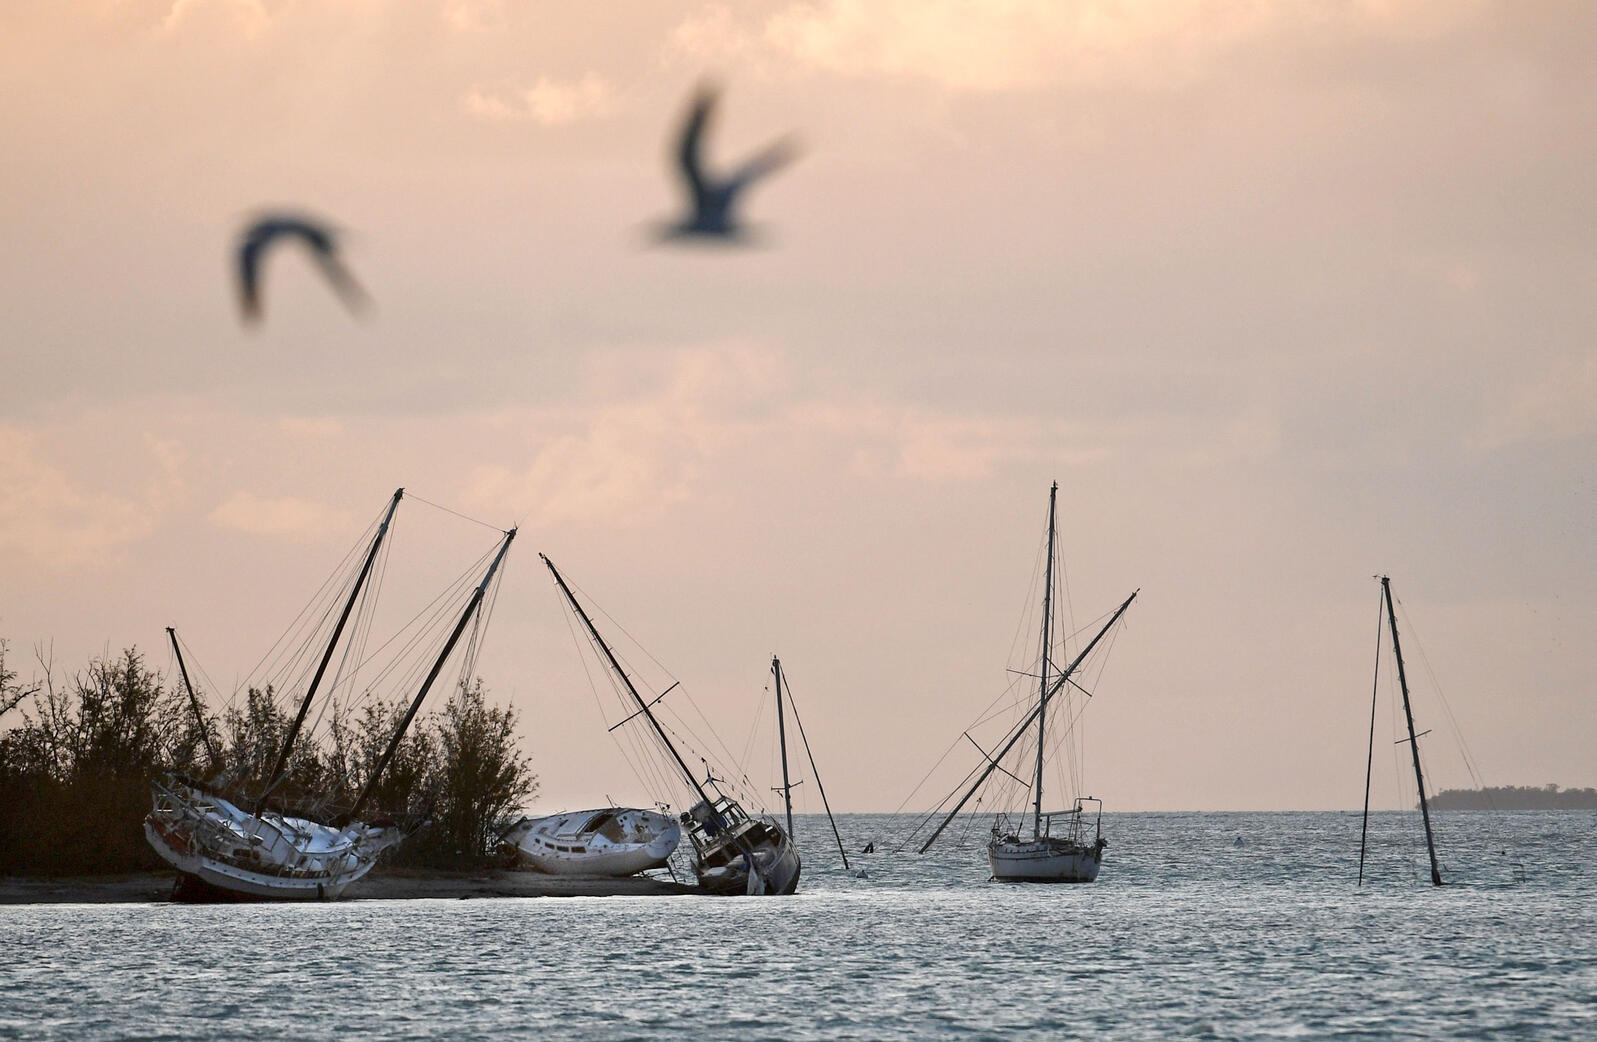 Sunken and beached sailboats after Hurricane Irma passed through the Florida Keys. Matt McClain/The Washington Post/AP